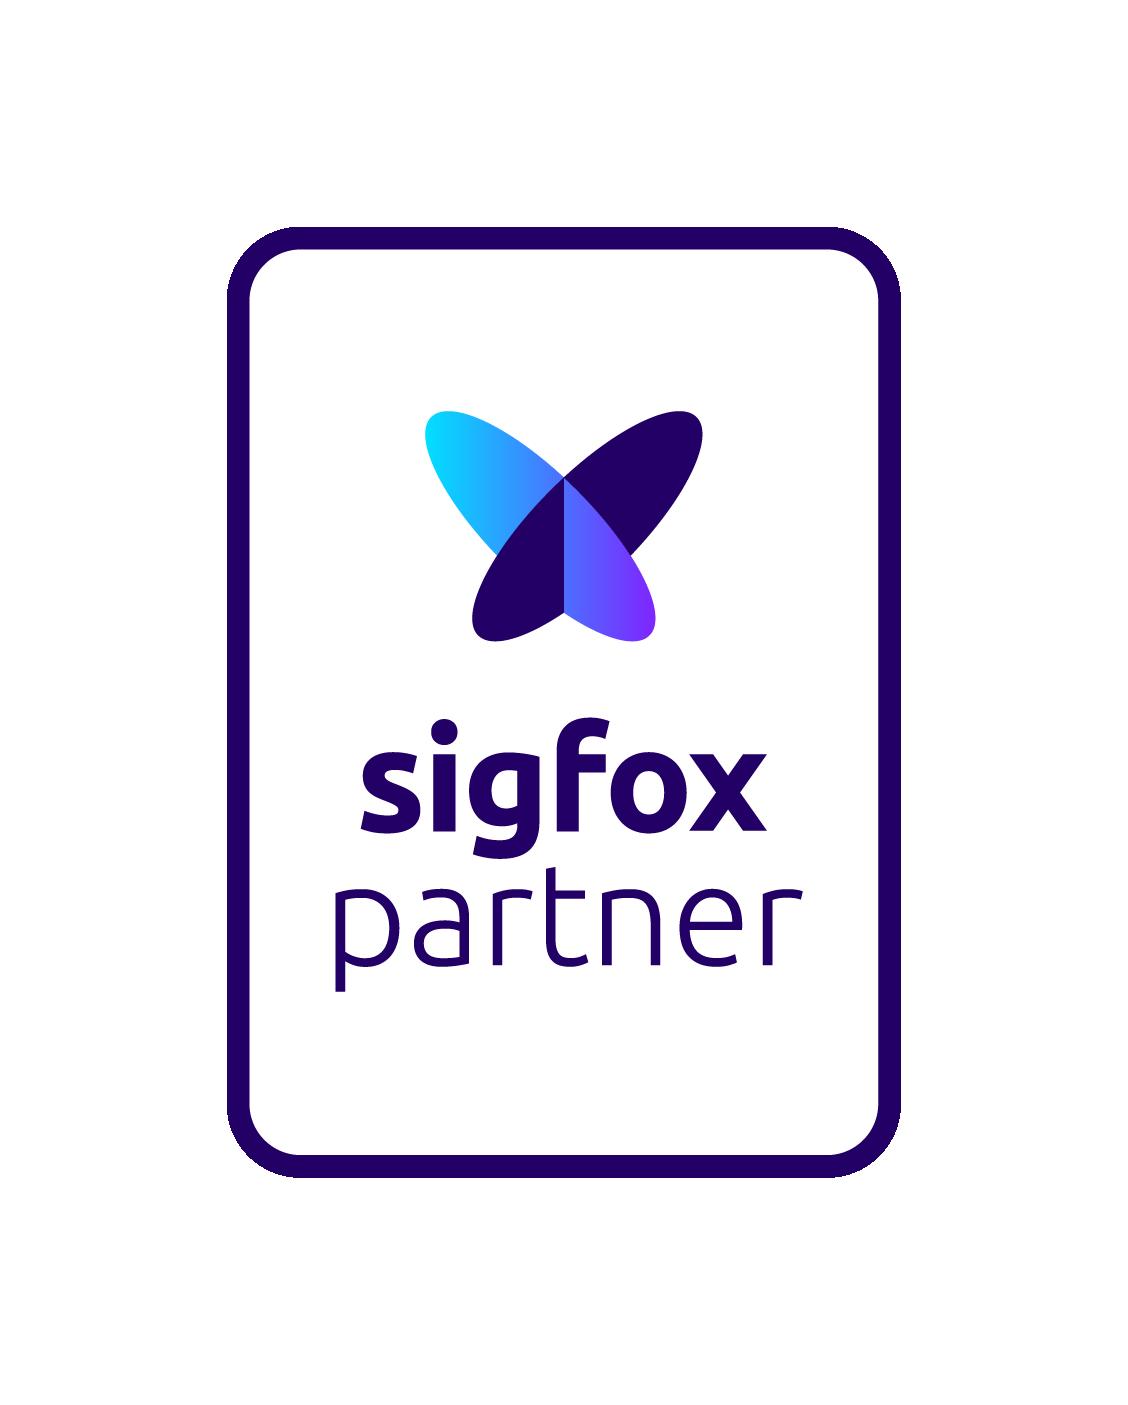 sigfox_partner_logo_rgb